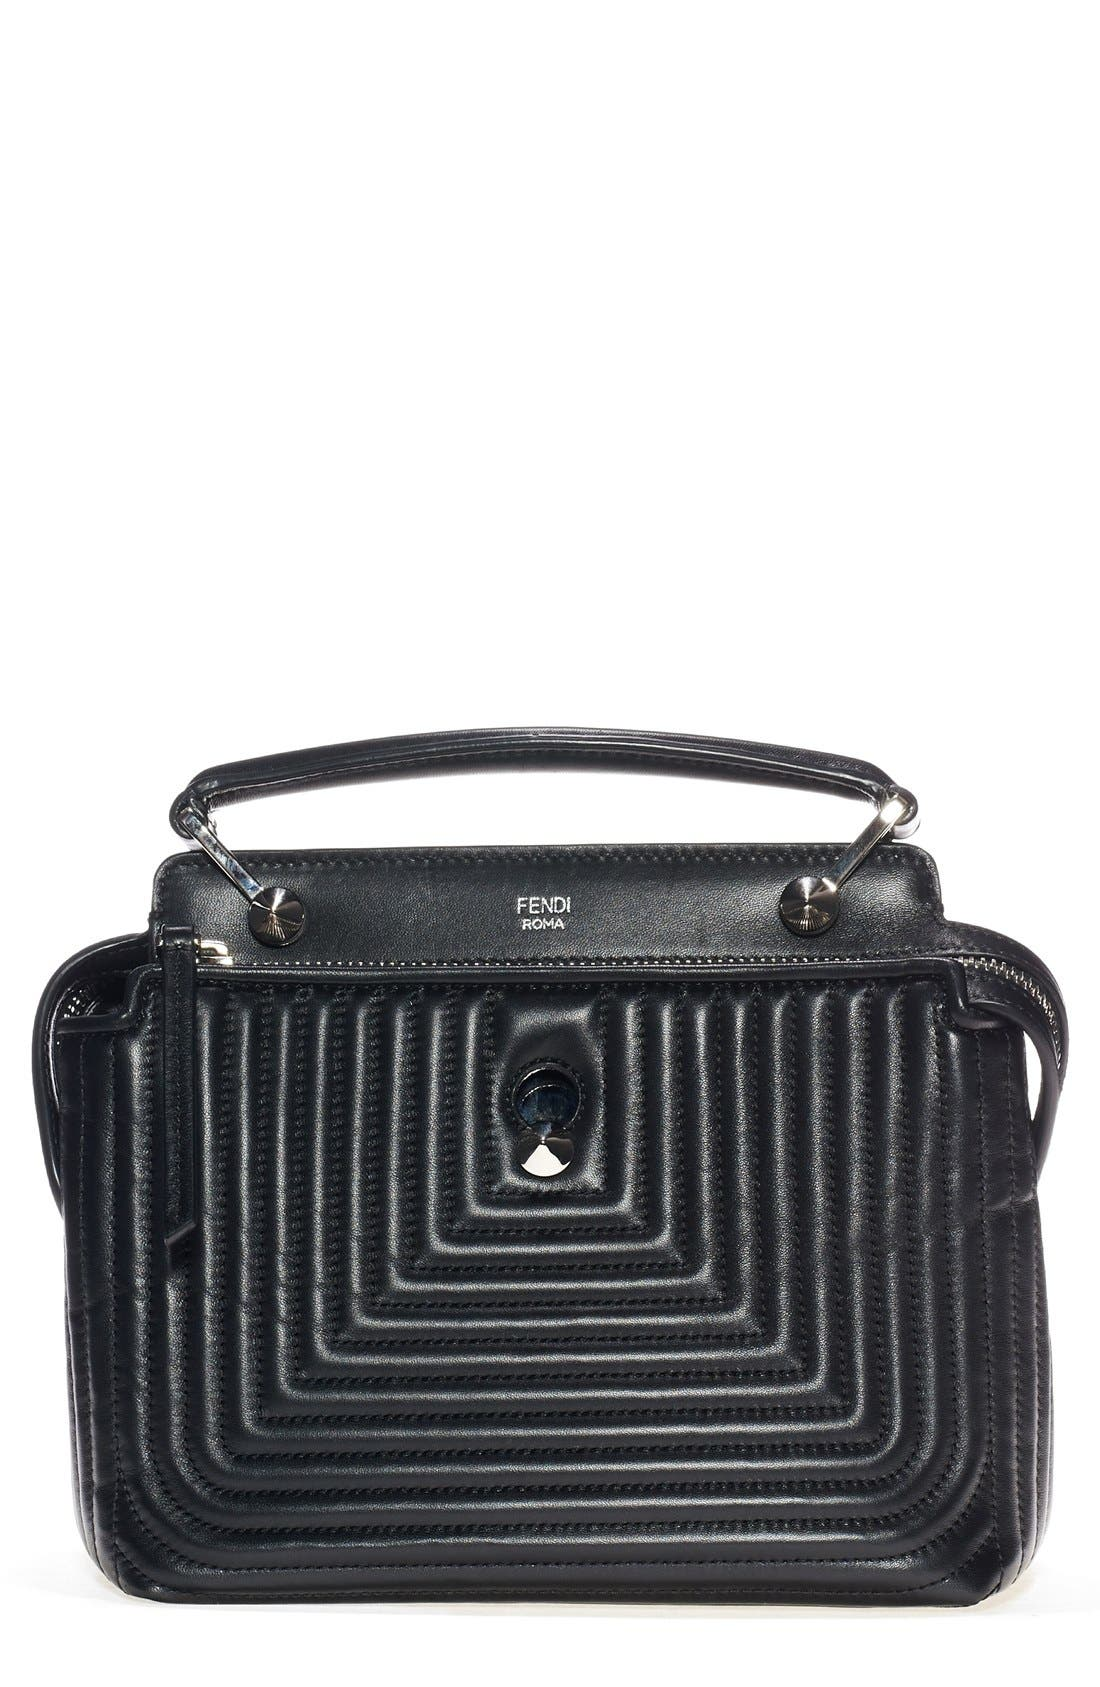 1b28bc6e6b Fendi Top Handle Bags UPC   Barcode